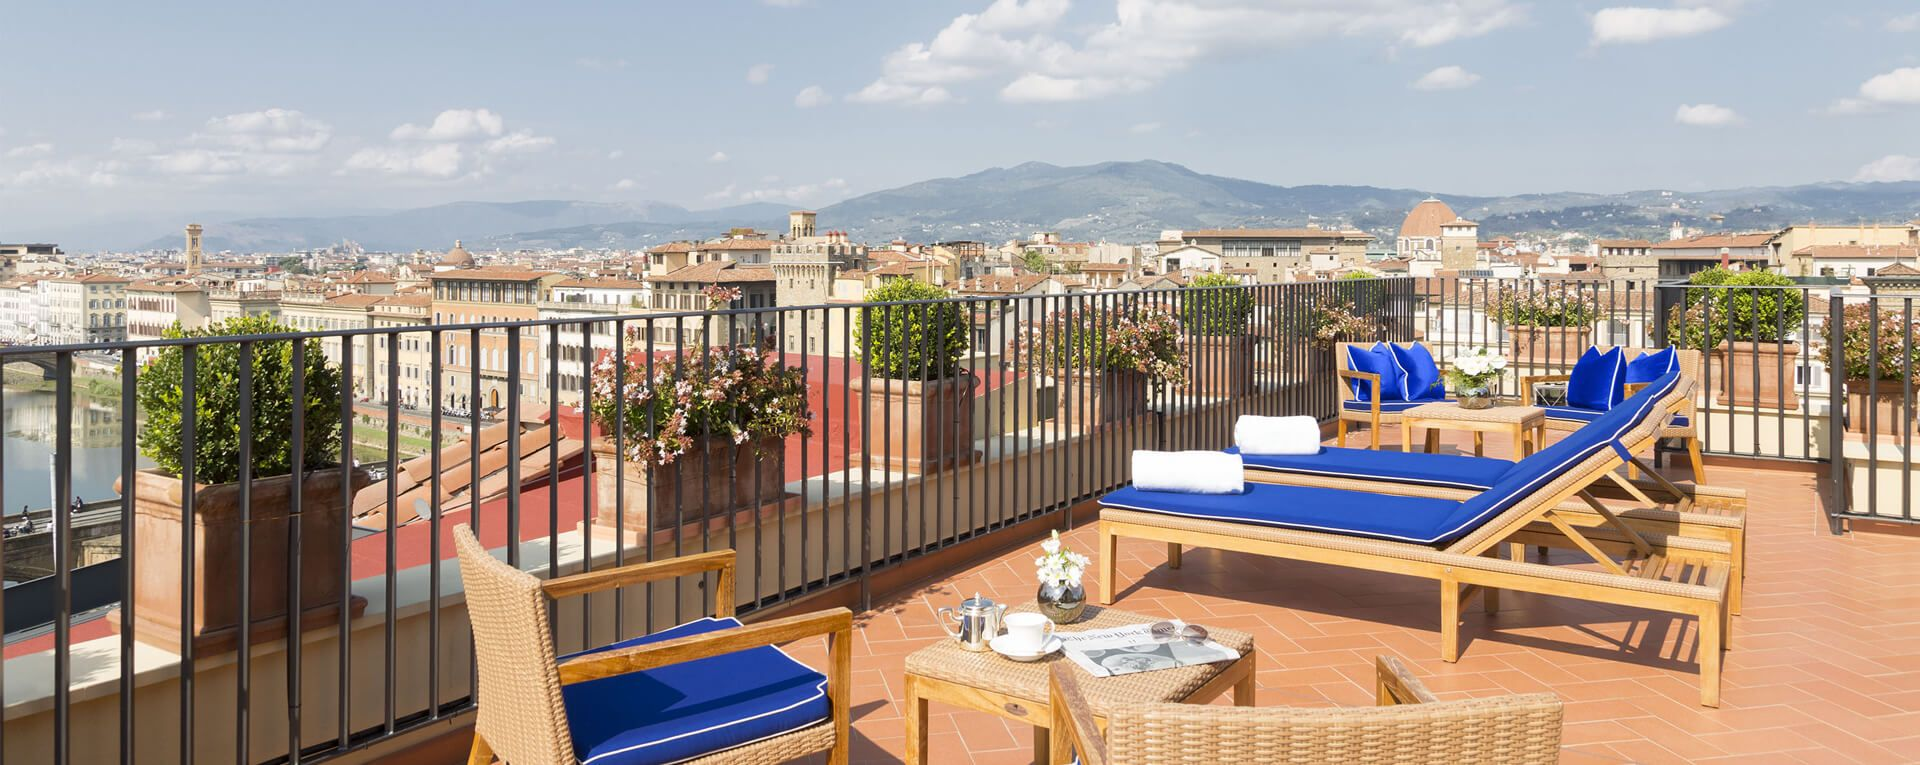 Hotel Lungarno